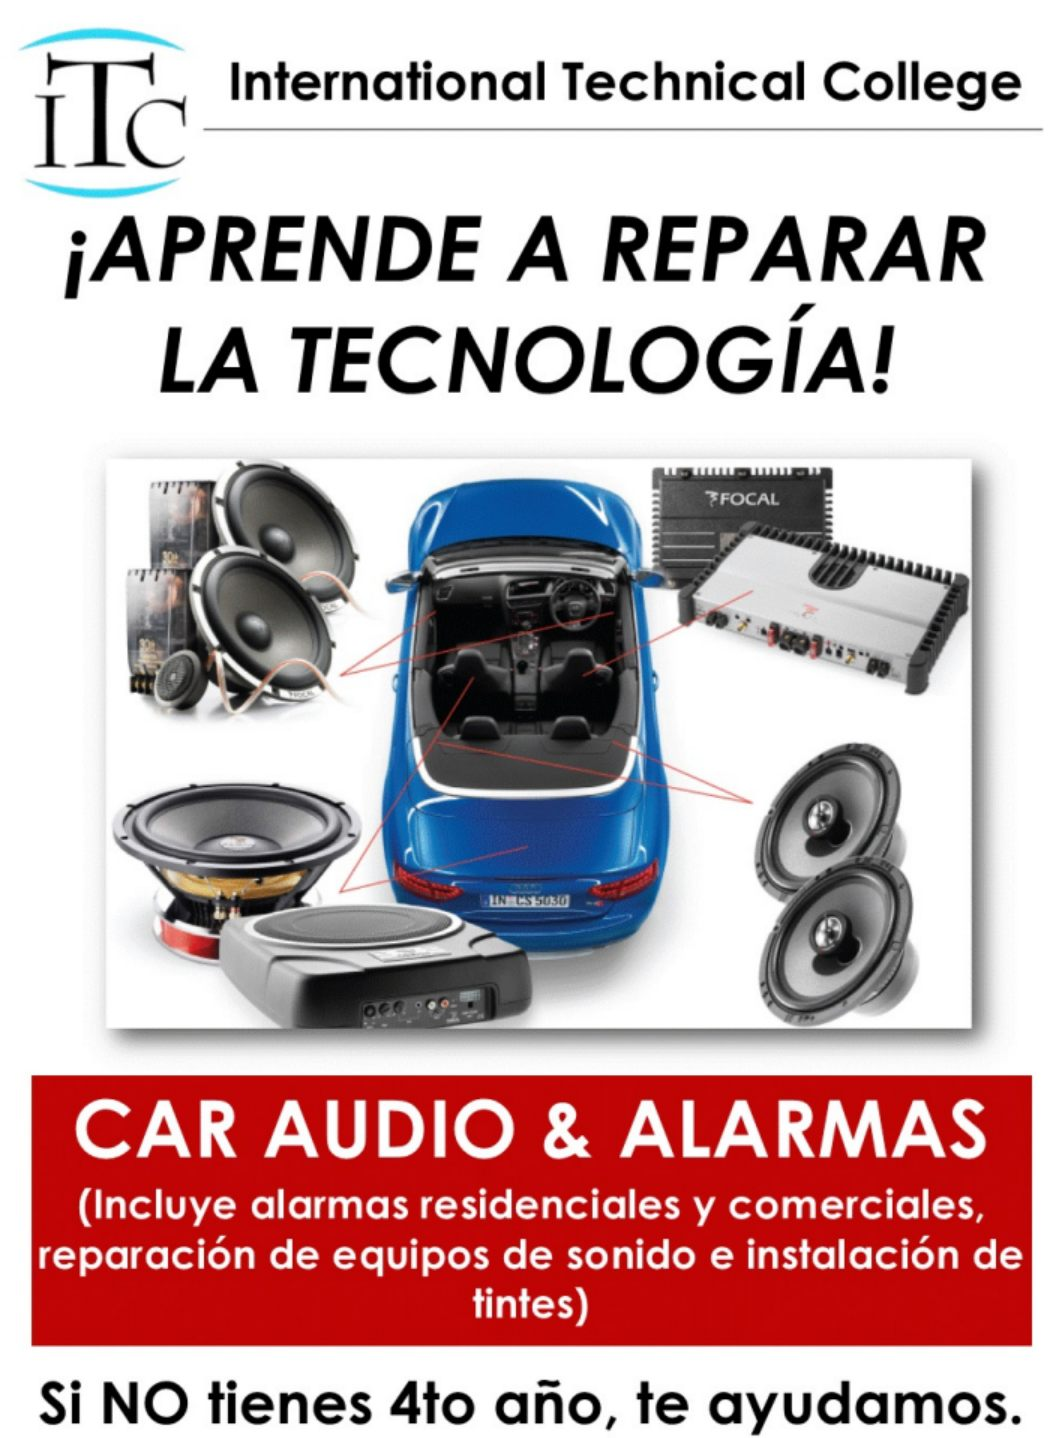 car audio2.jpg